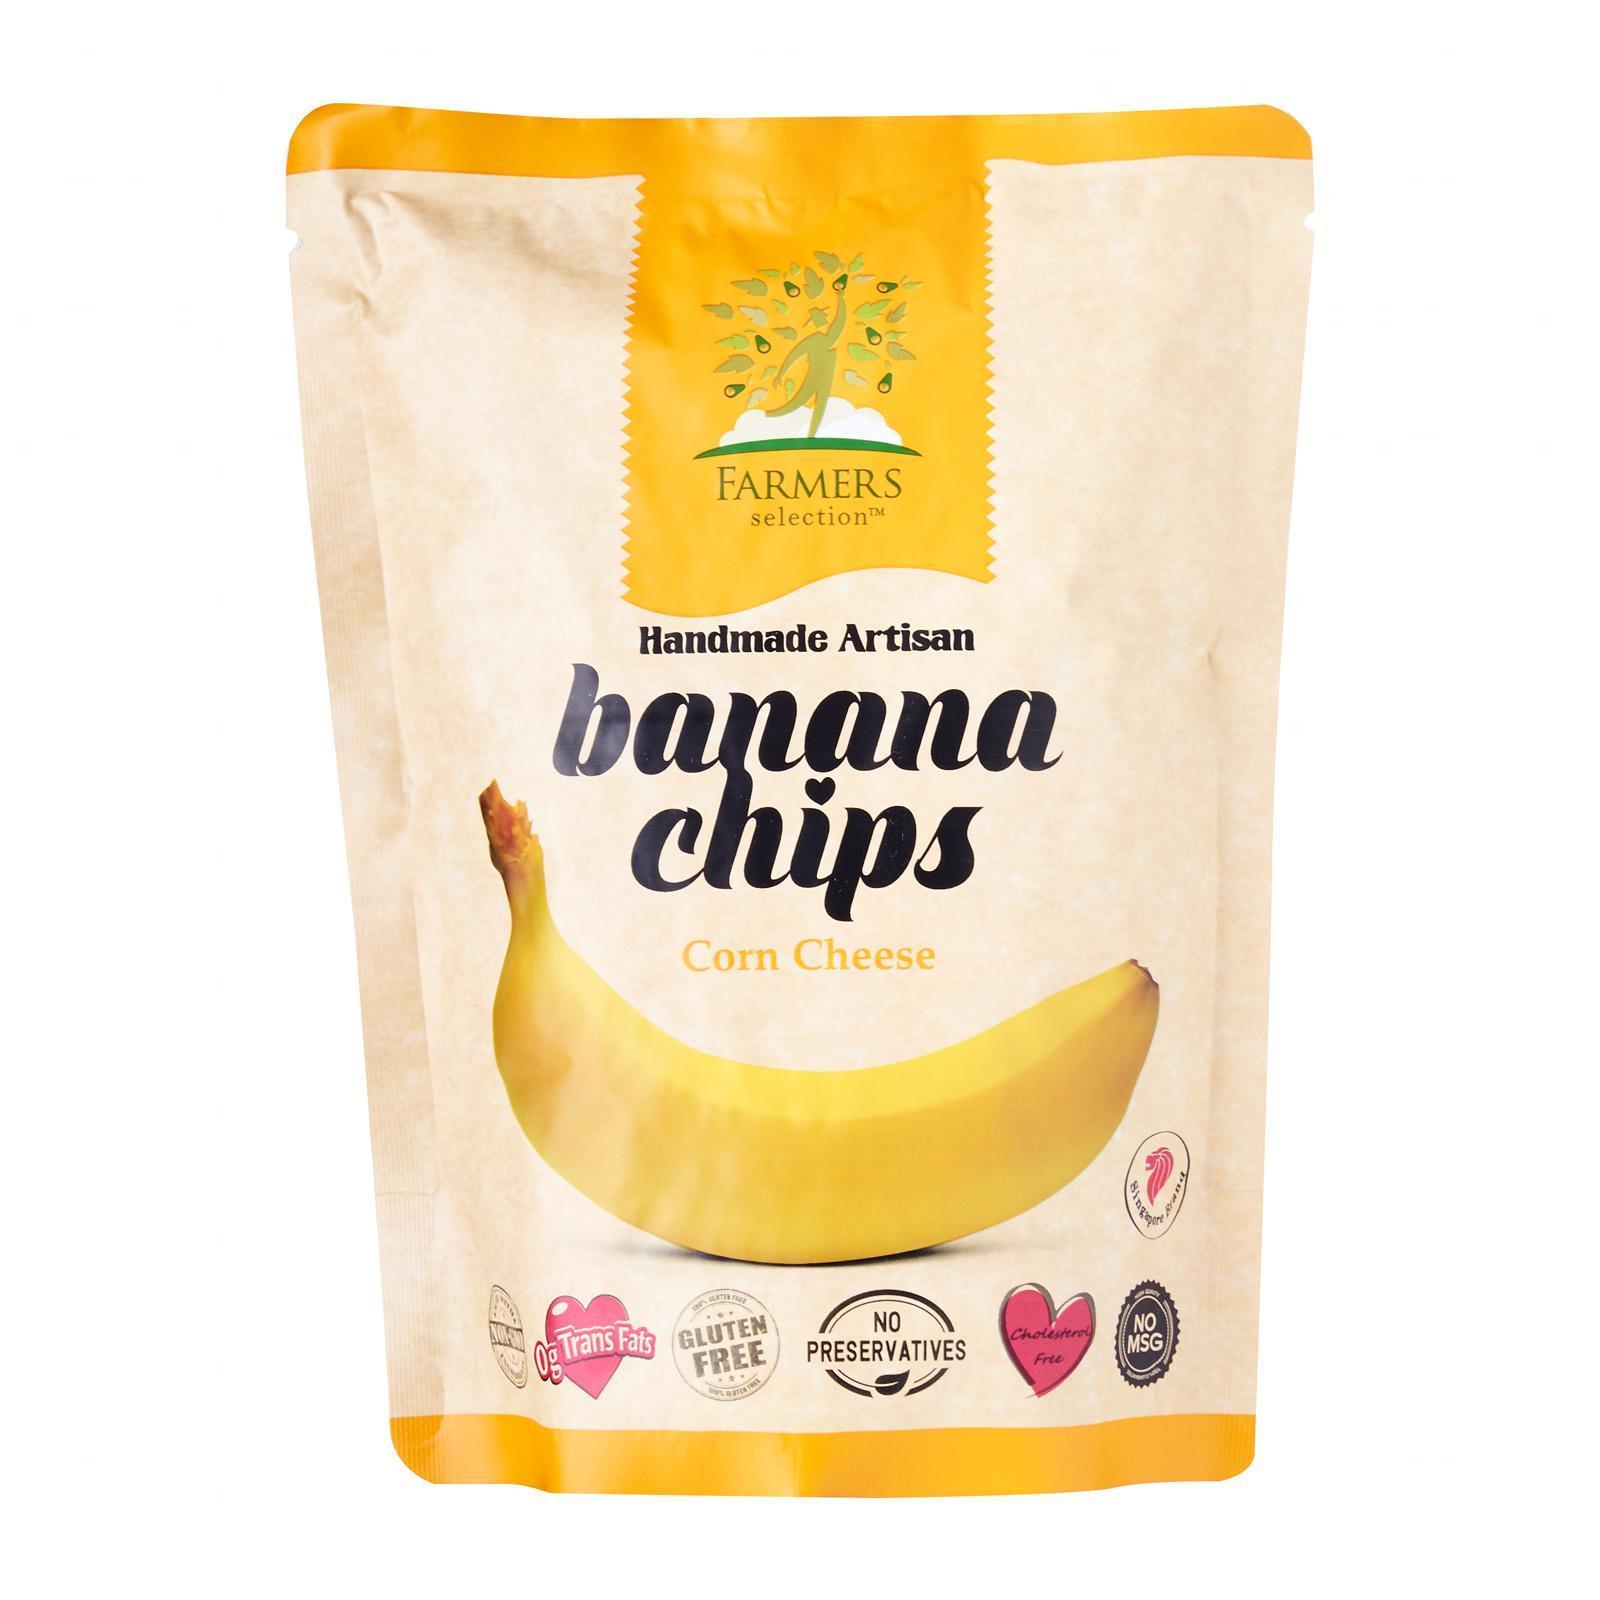 Farmers Selection Corn Cheese Banana Chips